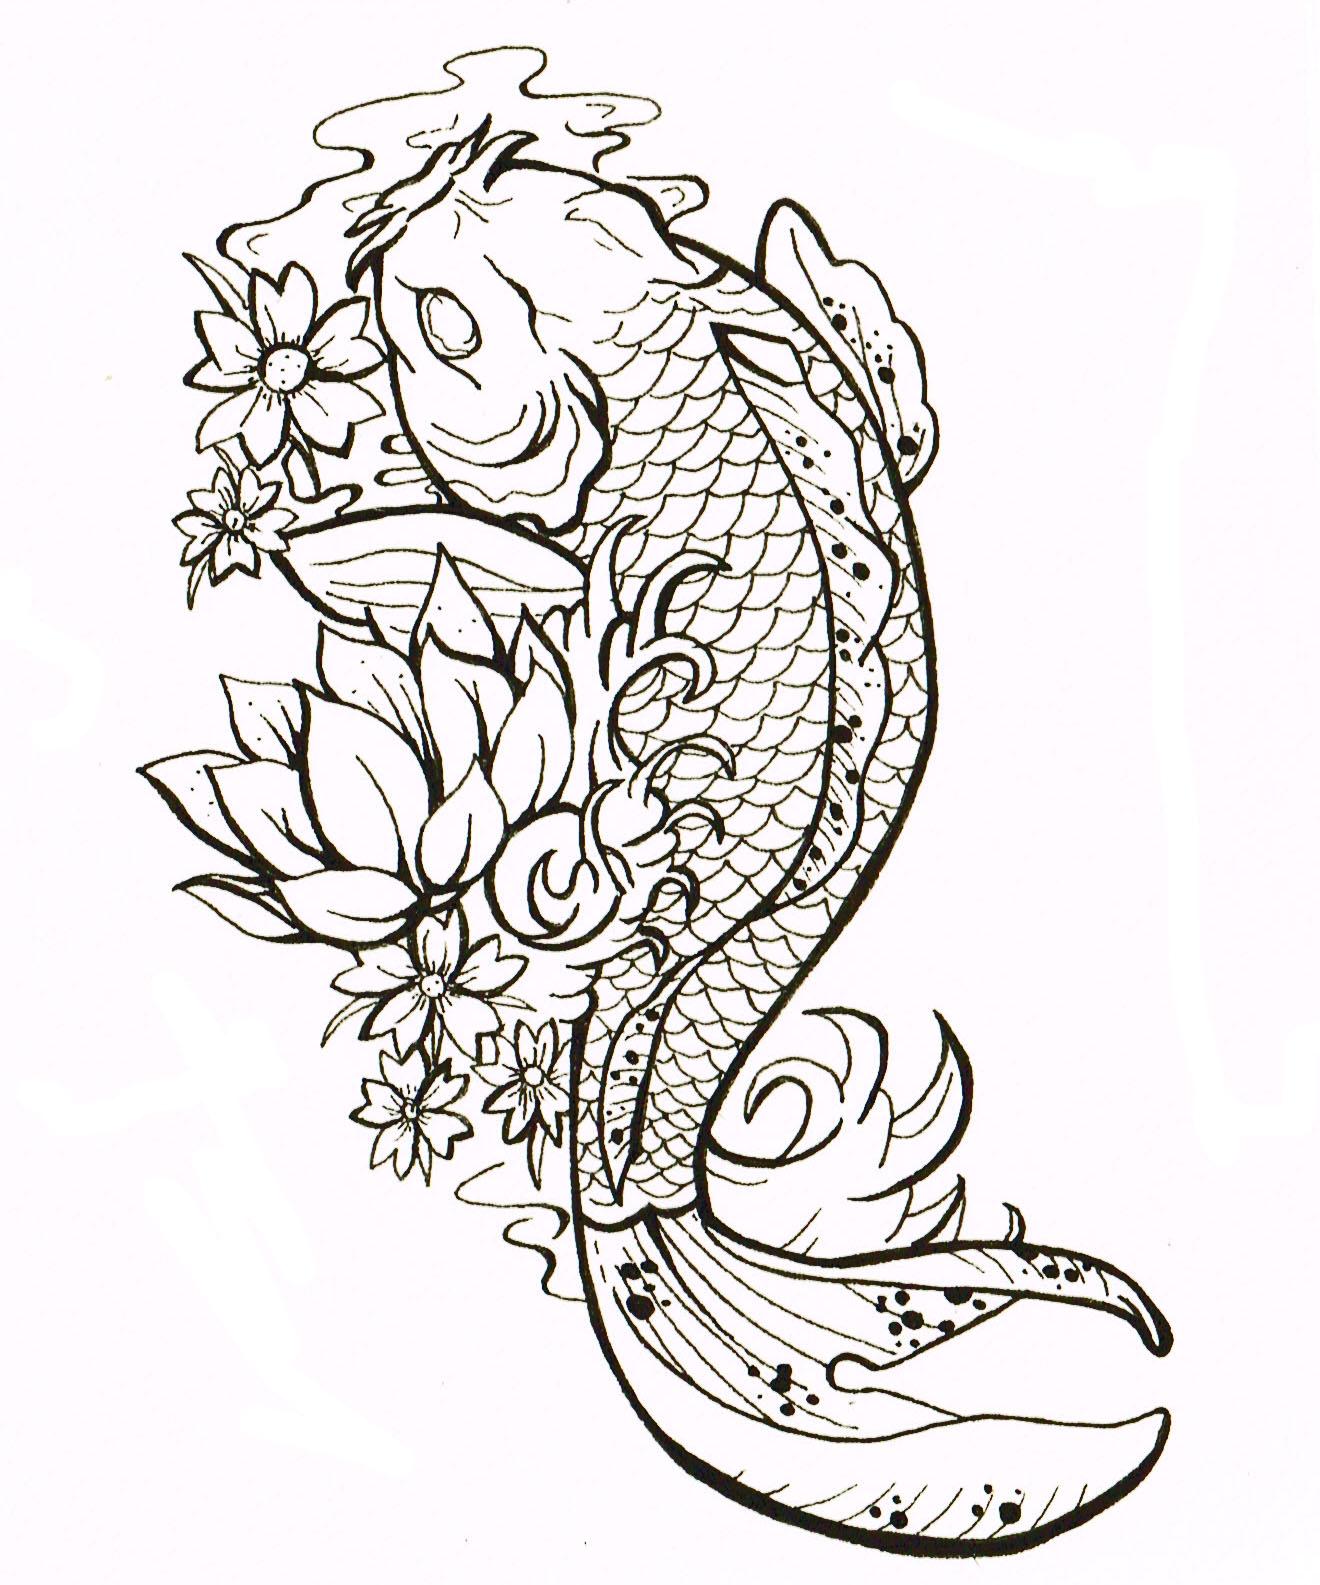 Pic new posts coy carp wallpaper for Coy carp tattoo